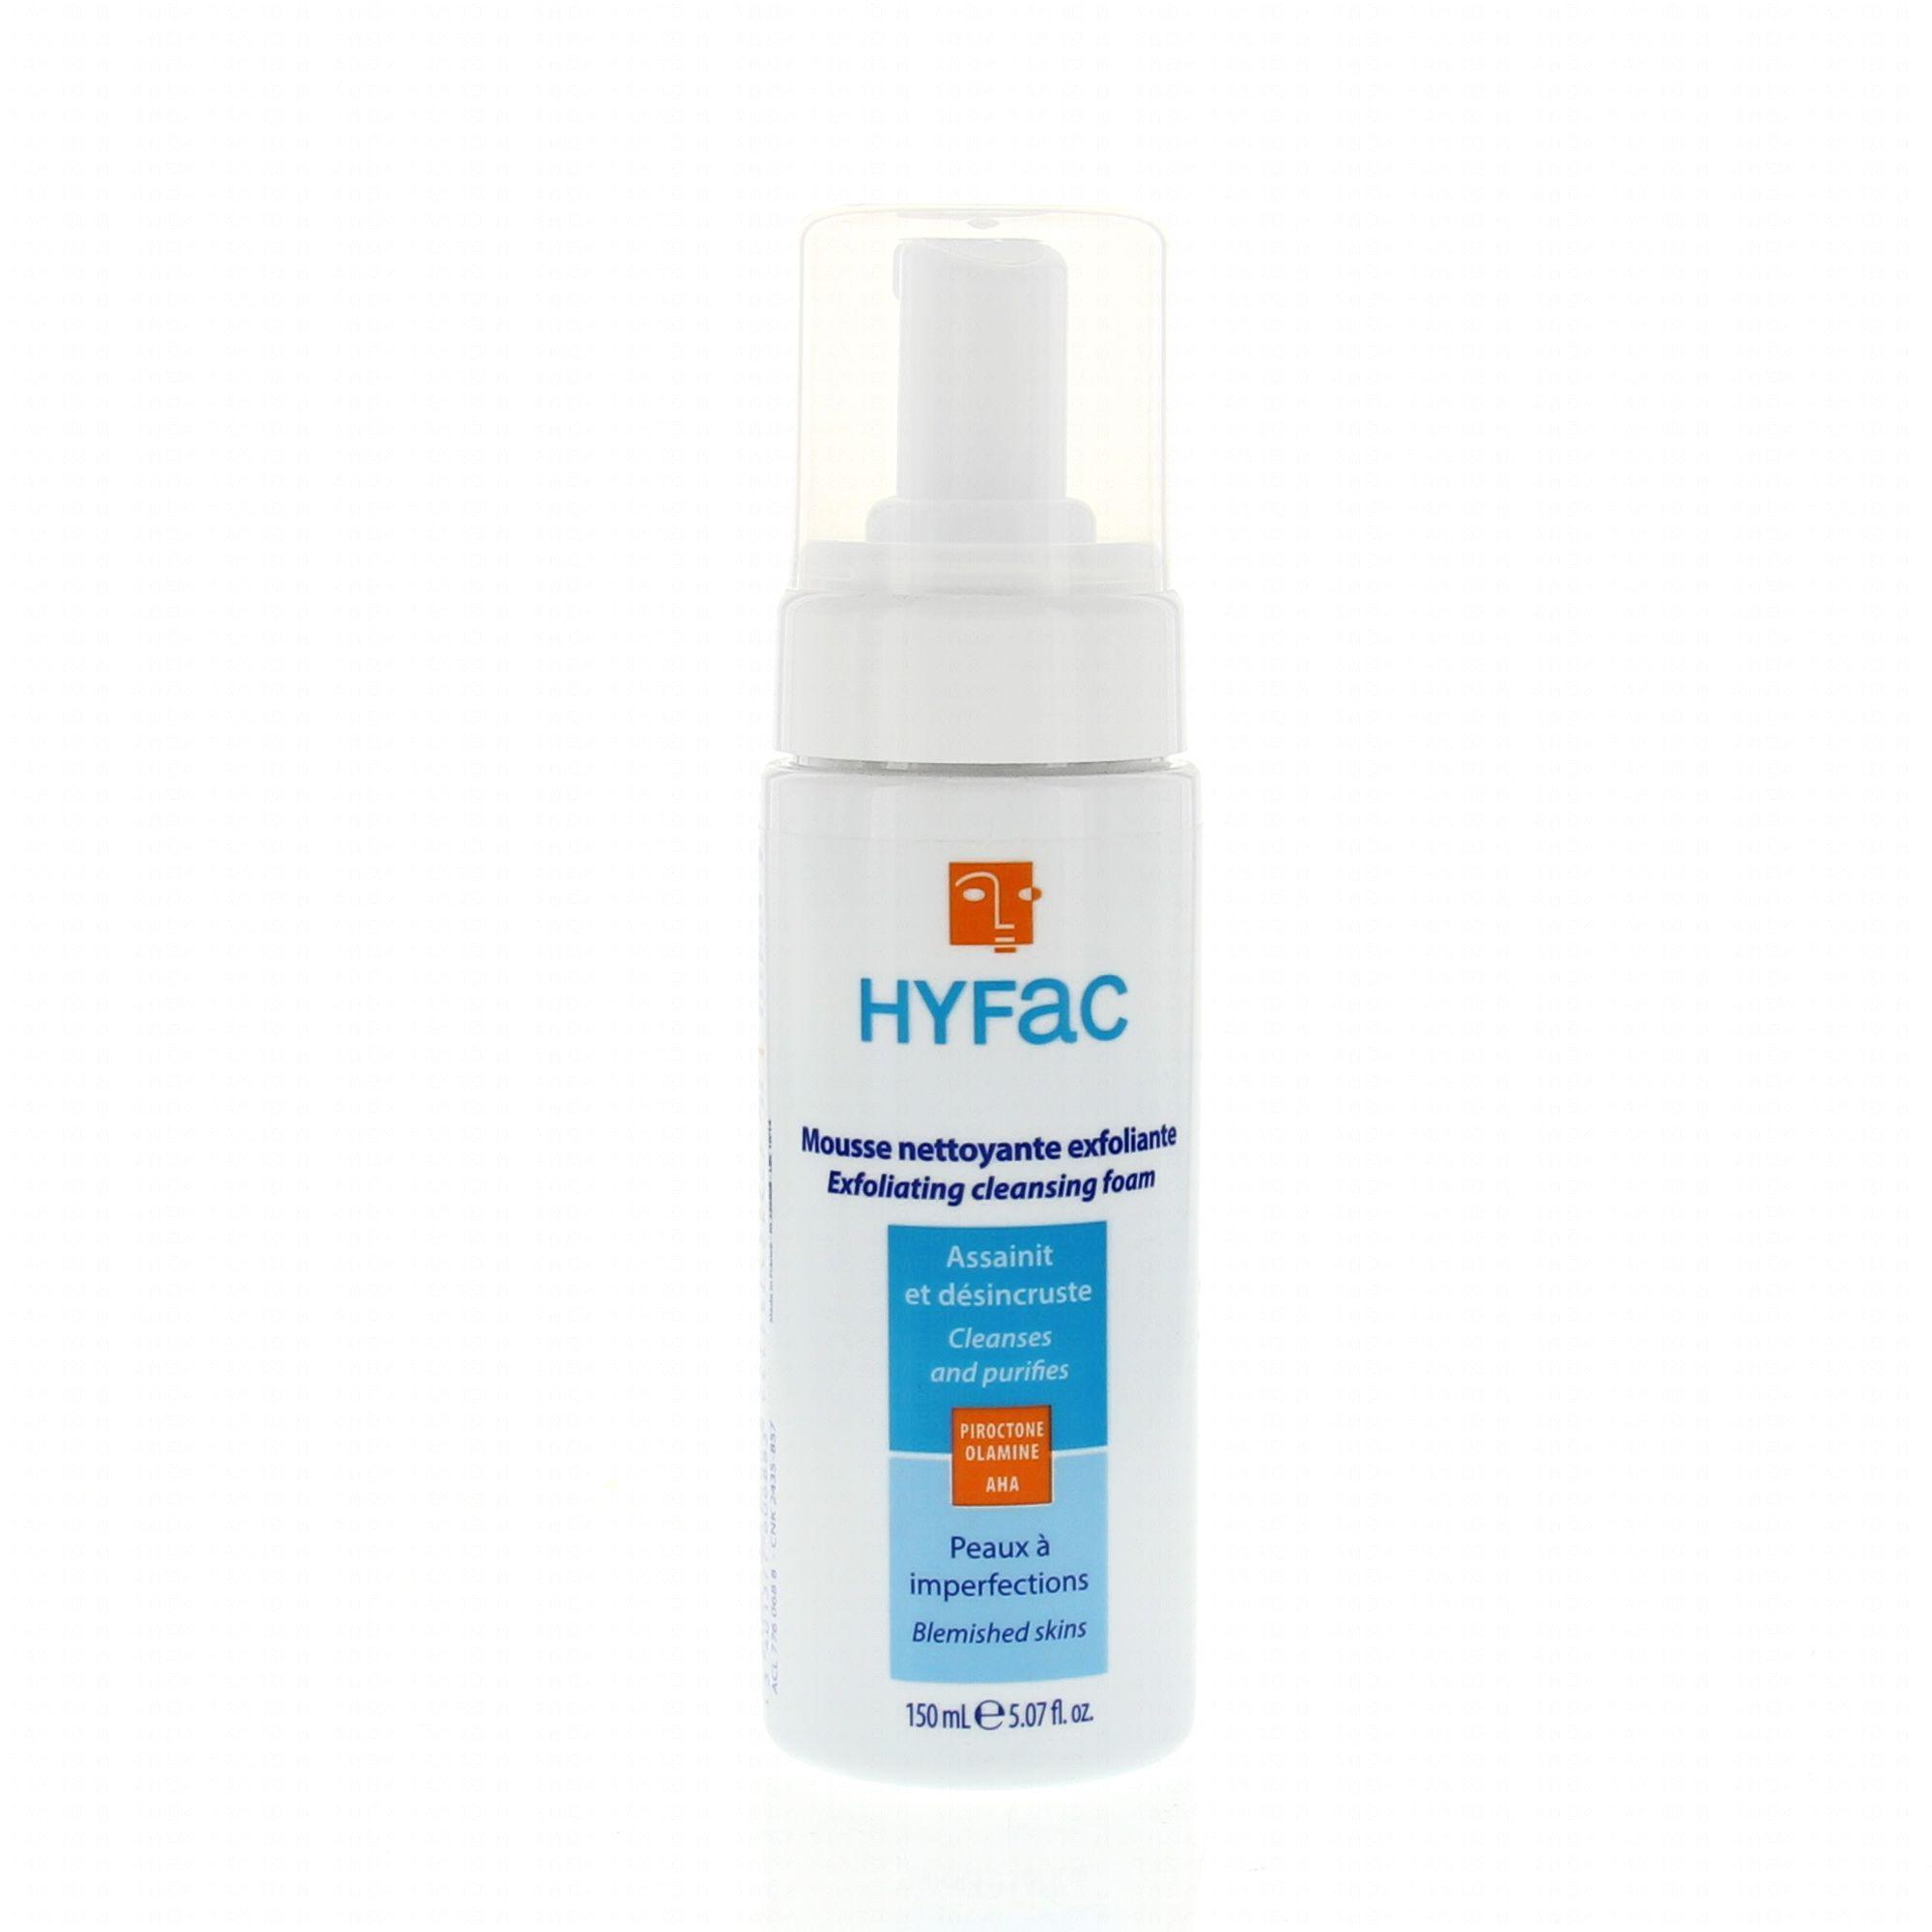 HYFAC MOUSSE NETTOYANTE EXFOLIANTE 150 ML